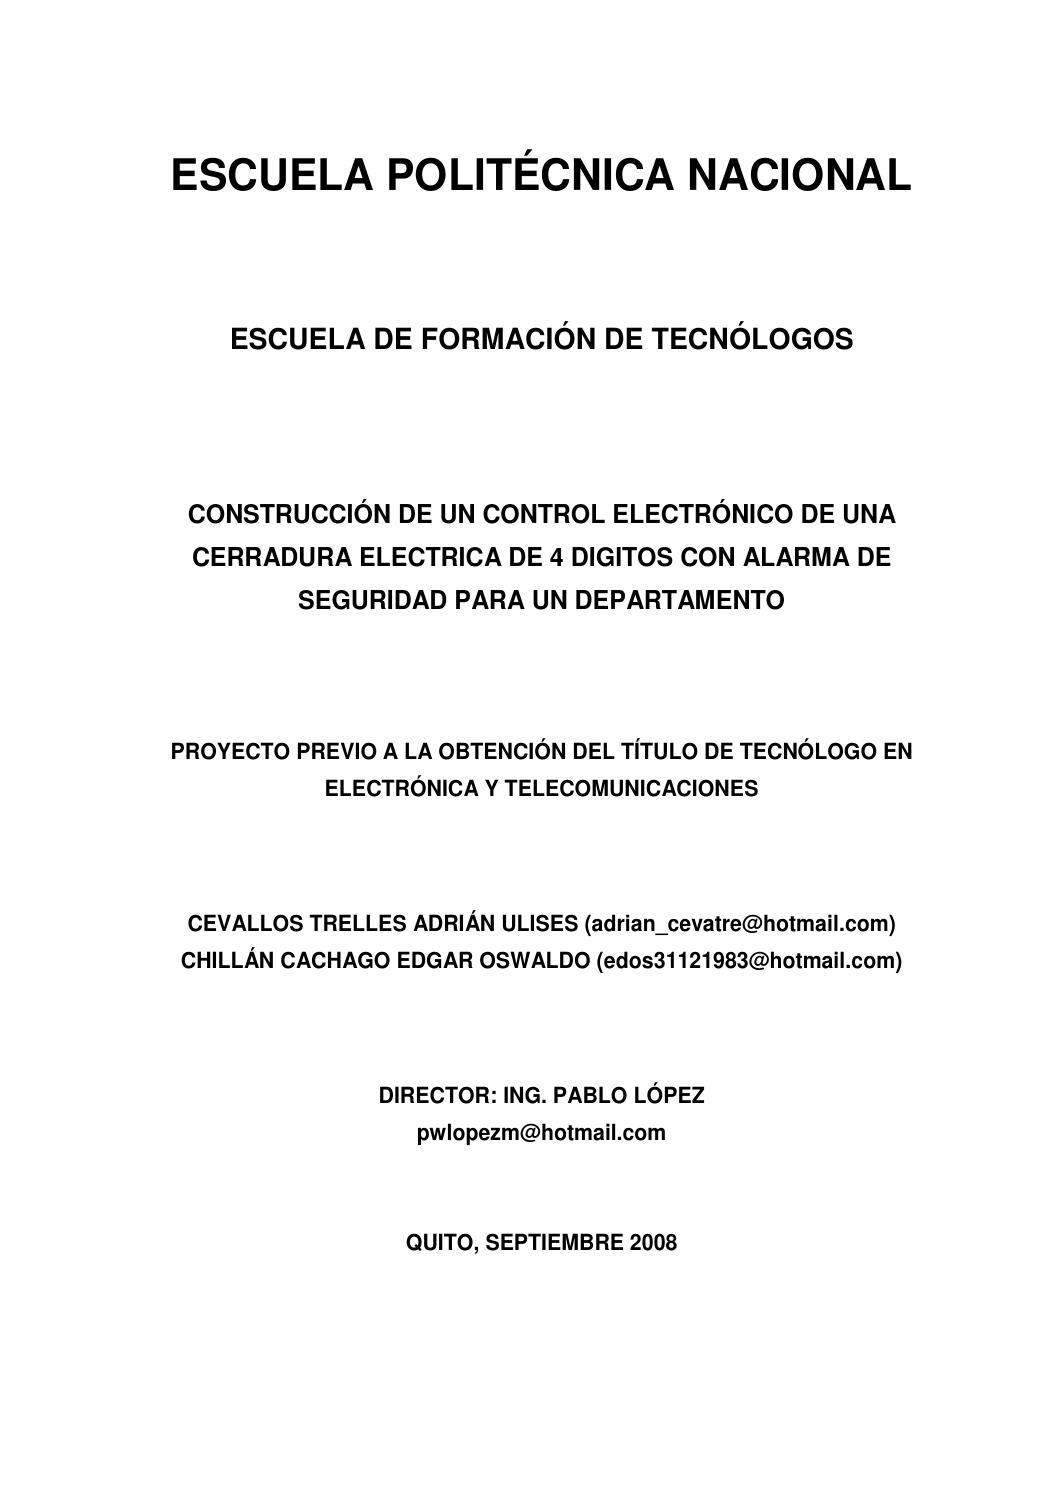 Cerradura electronica by Ivan Viton Bazan - issuu